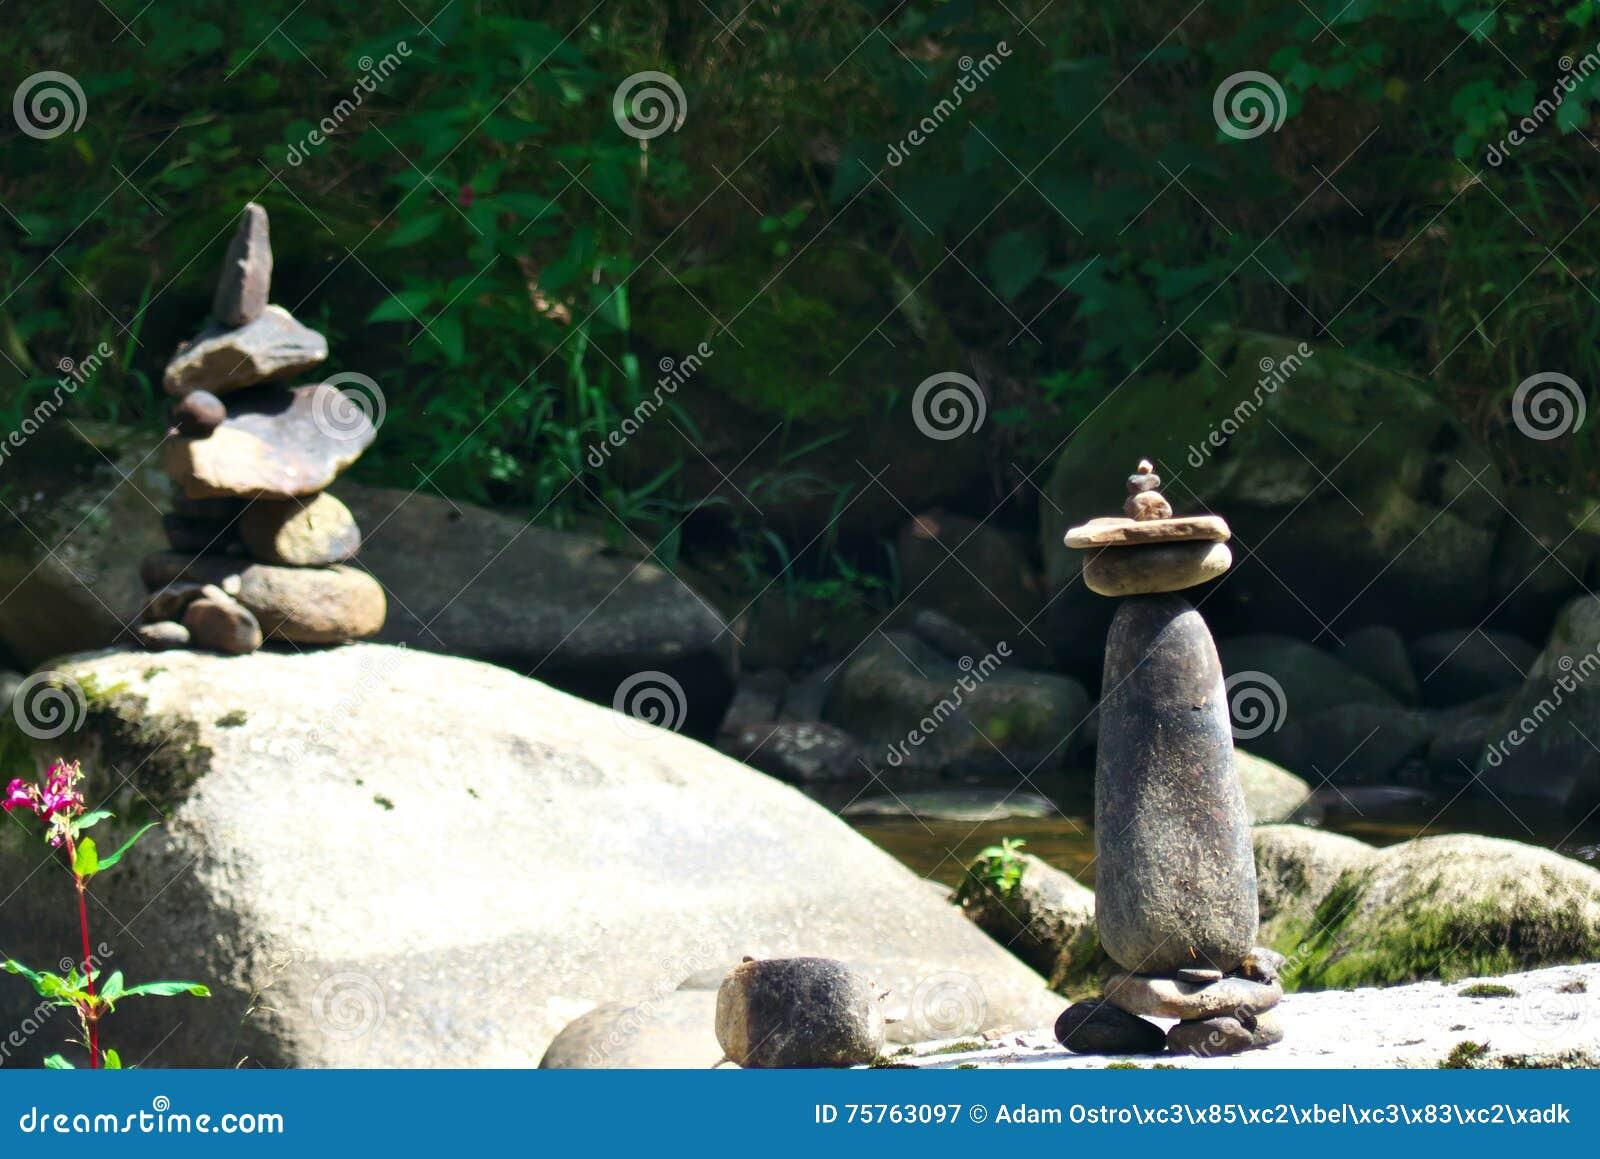 Estatuas de la roca